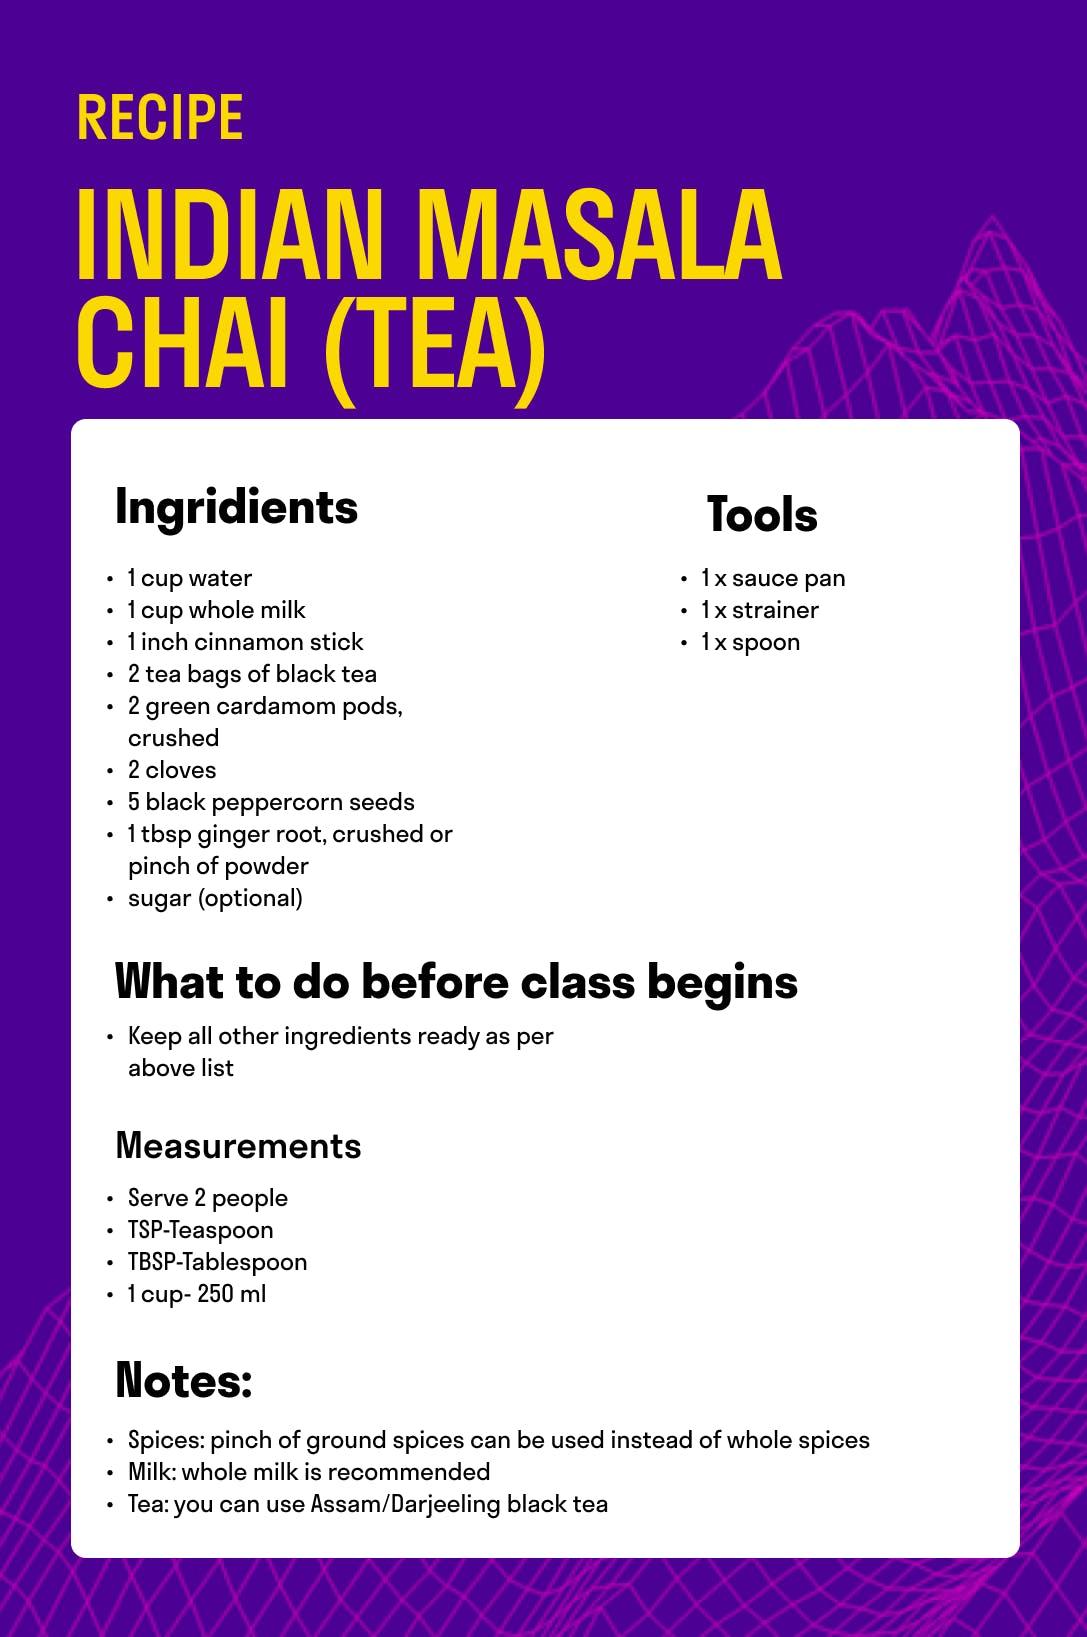 INDIAN MASALA CHAI (TEA).png